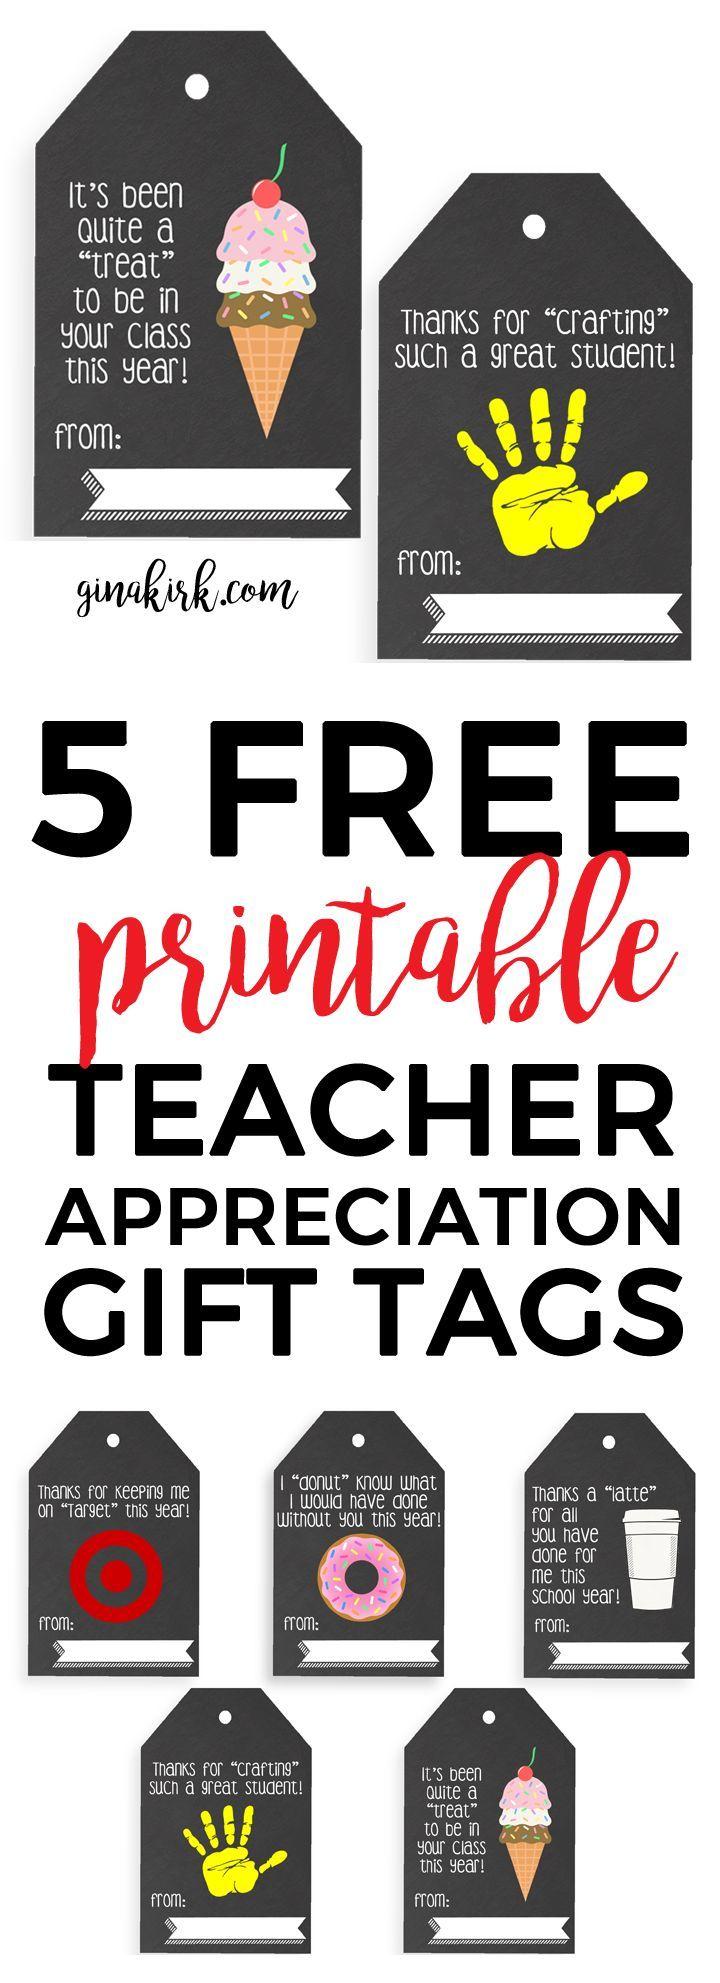 Teacher appreciation gift | DIY teacher gift idea | Printable tag for teacher crafts and gifts! | GinaKirk.com @Gina Kirk